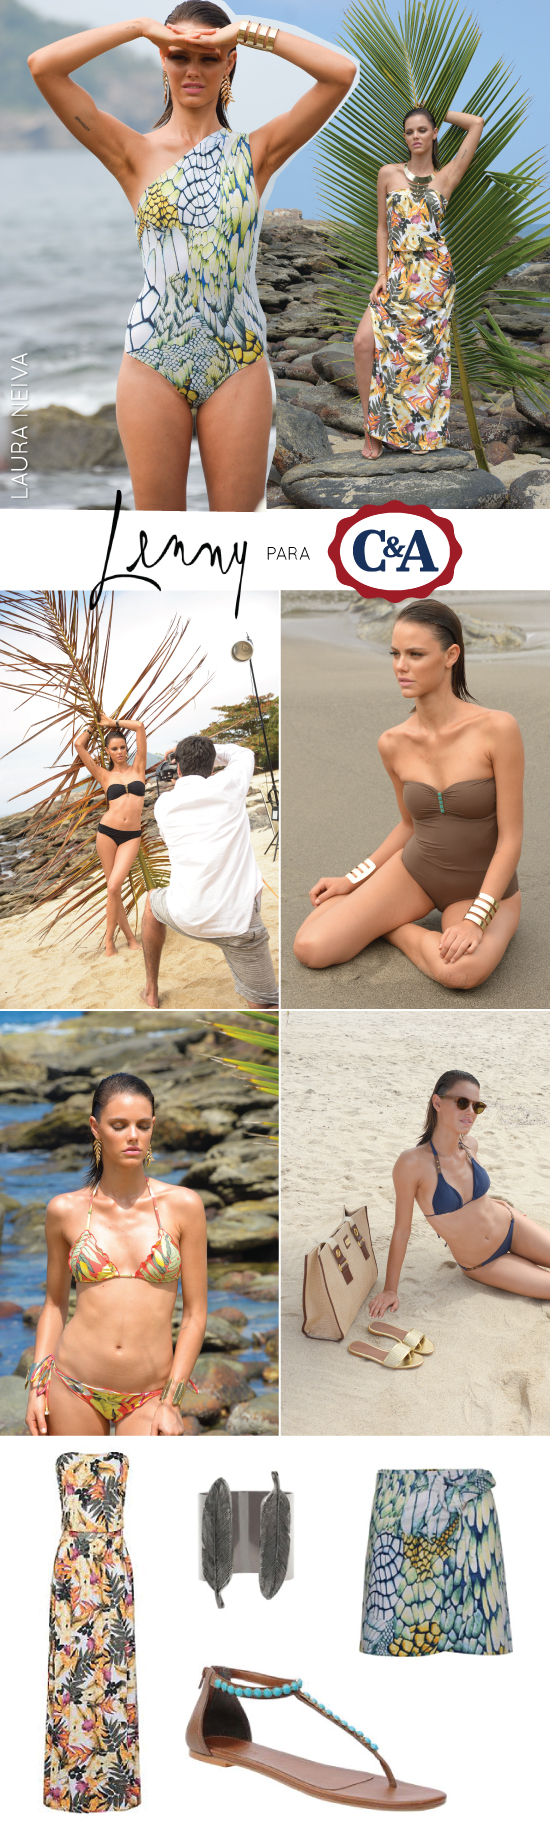 lenny-para-c&a-cea-laura-neiva-making-of-max-weber-biquini-maio-moda-praia-preview-video-especial-pecas